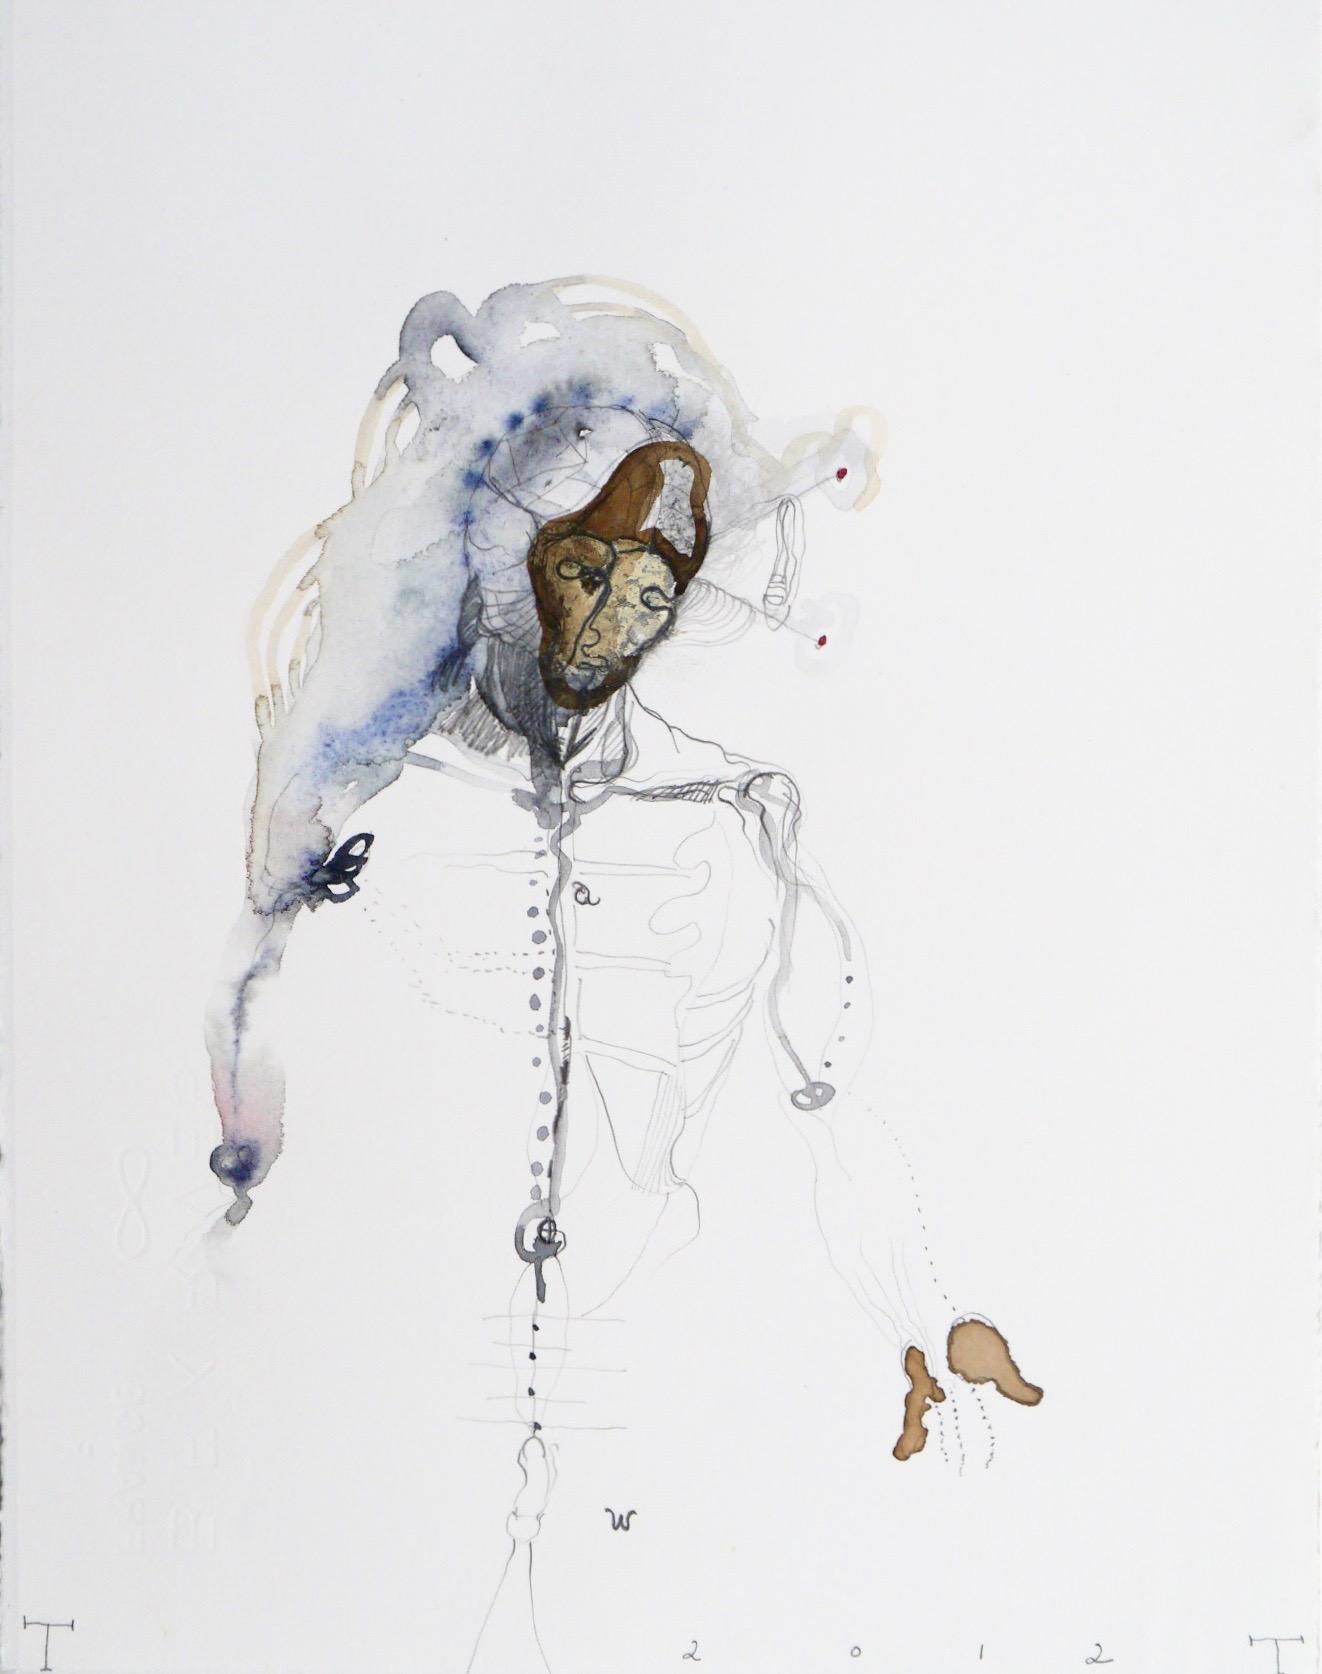 Vesalius study, mixed media on paper, 33 X 25 cm, 2012